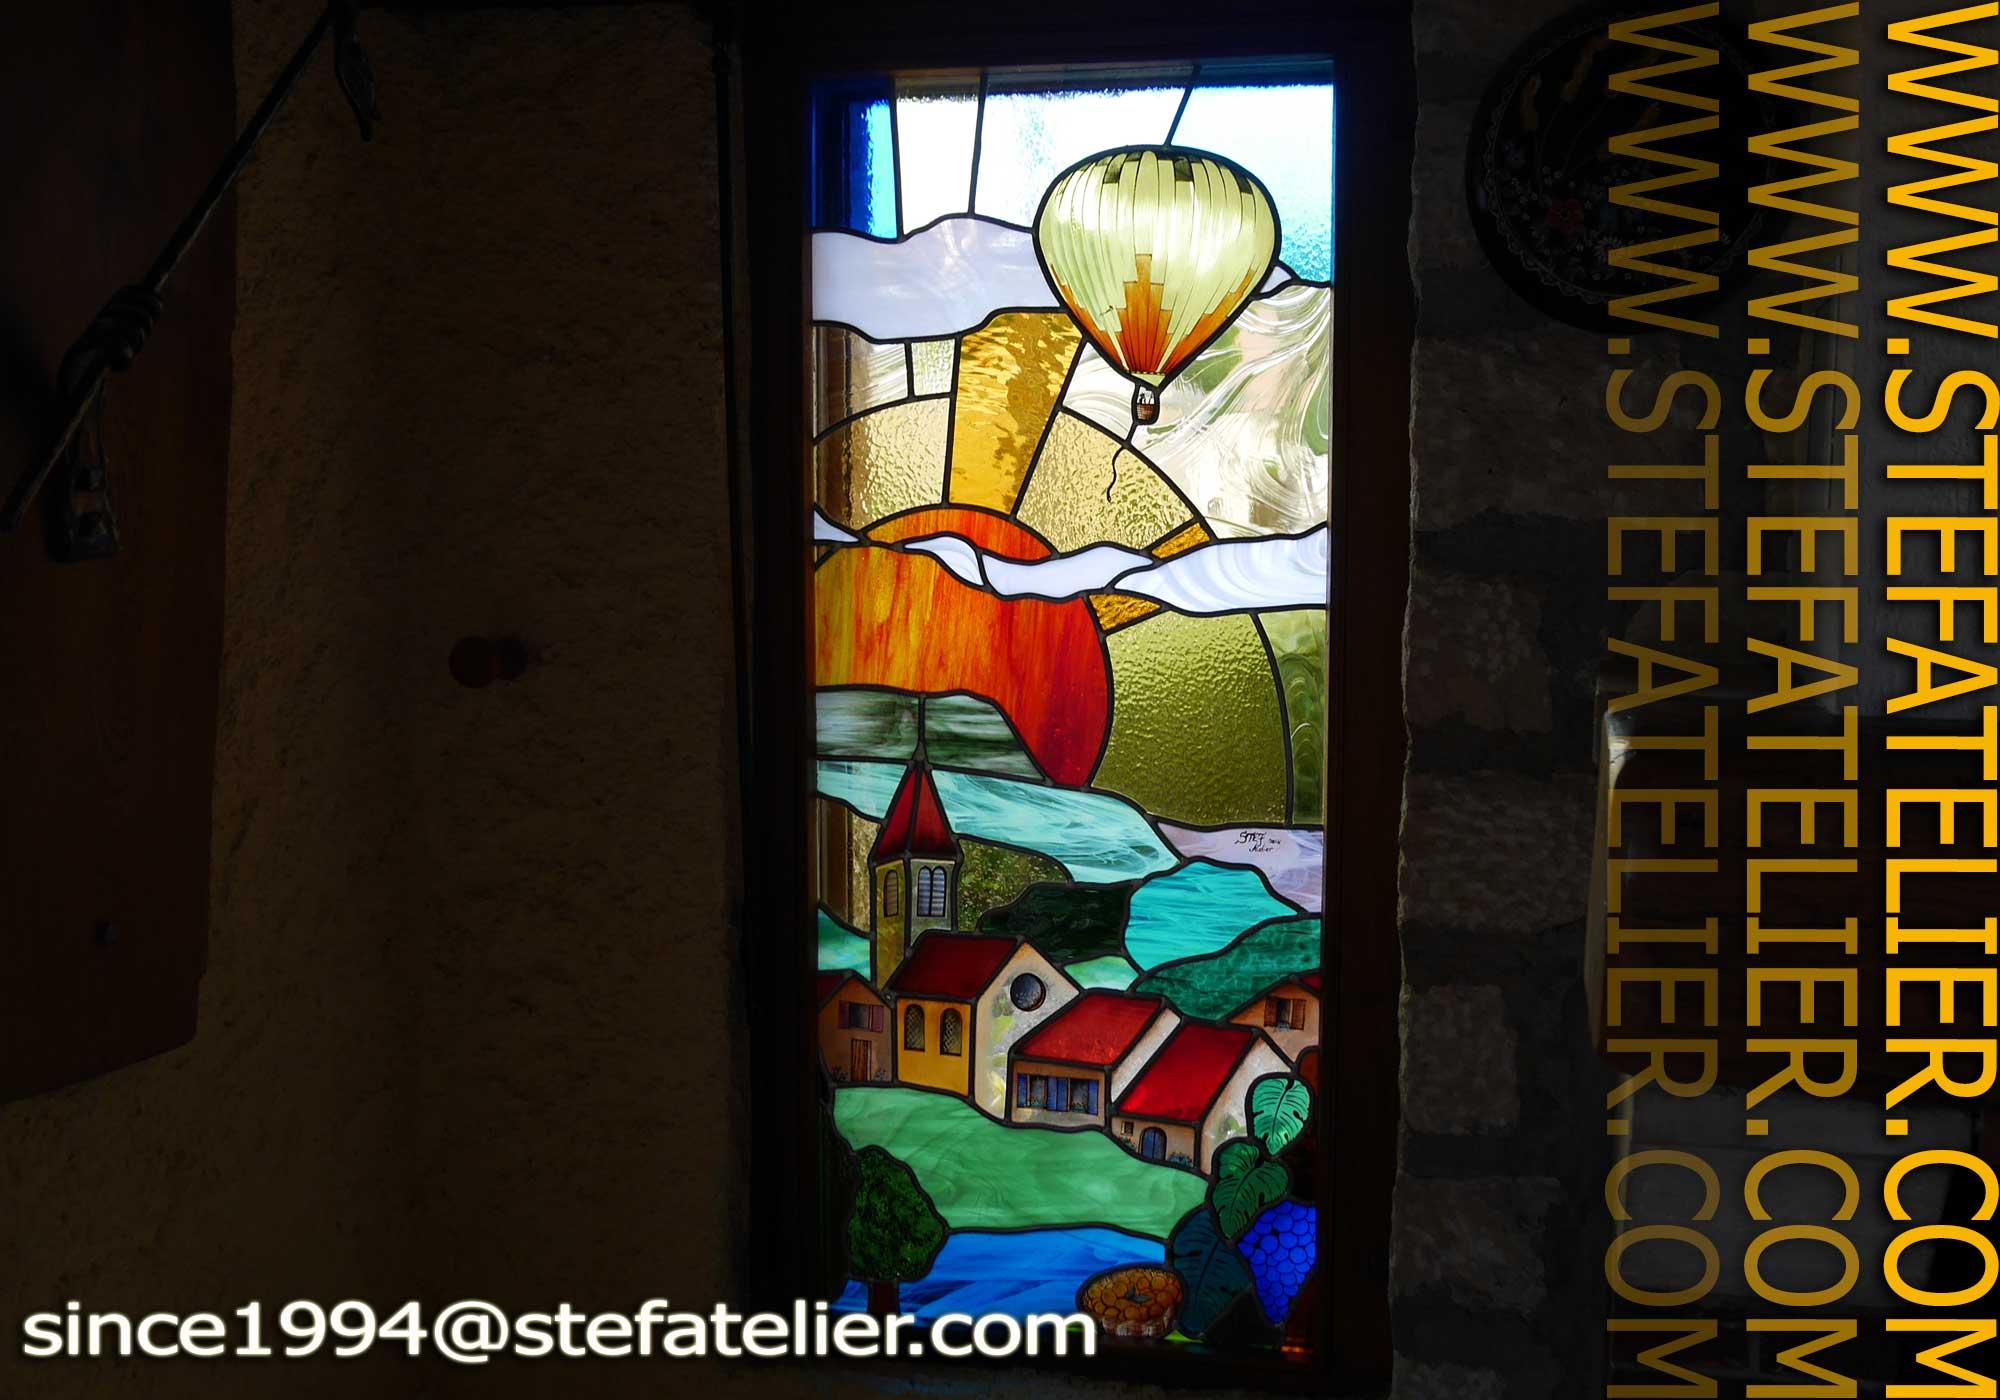 Ao t 2014 stef atelier vitraux d art for Fenetre en vitrail